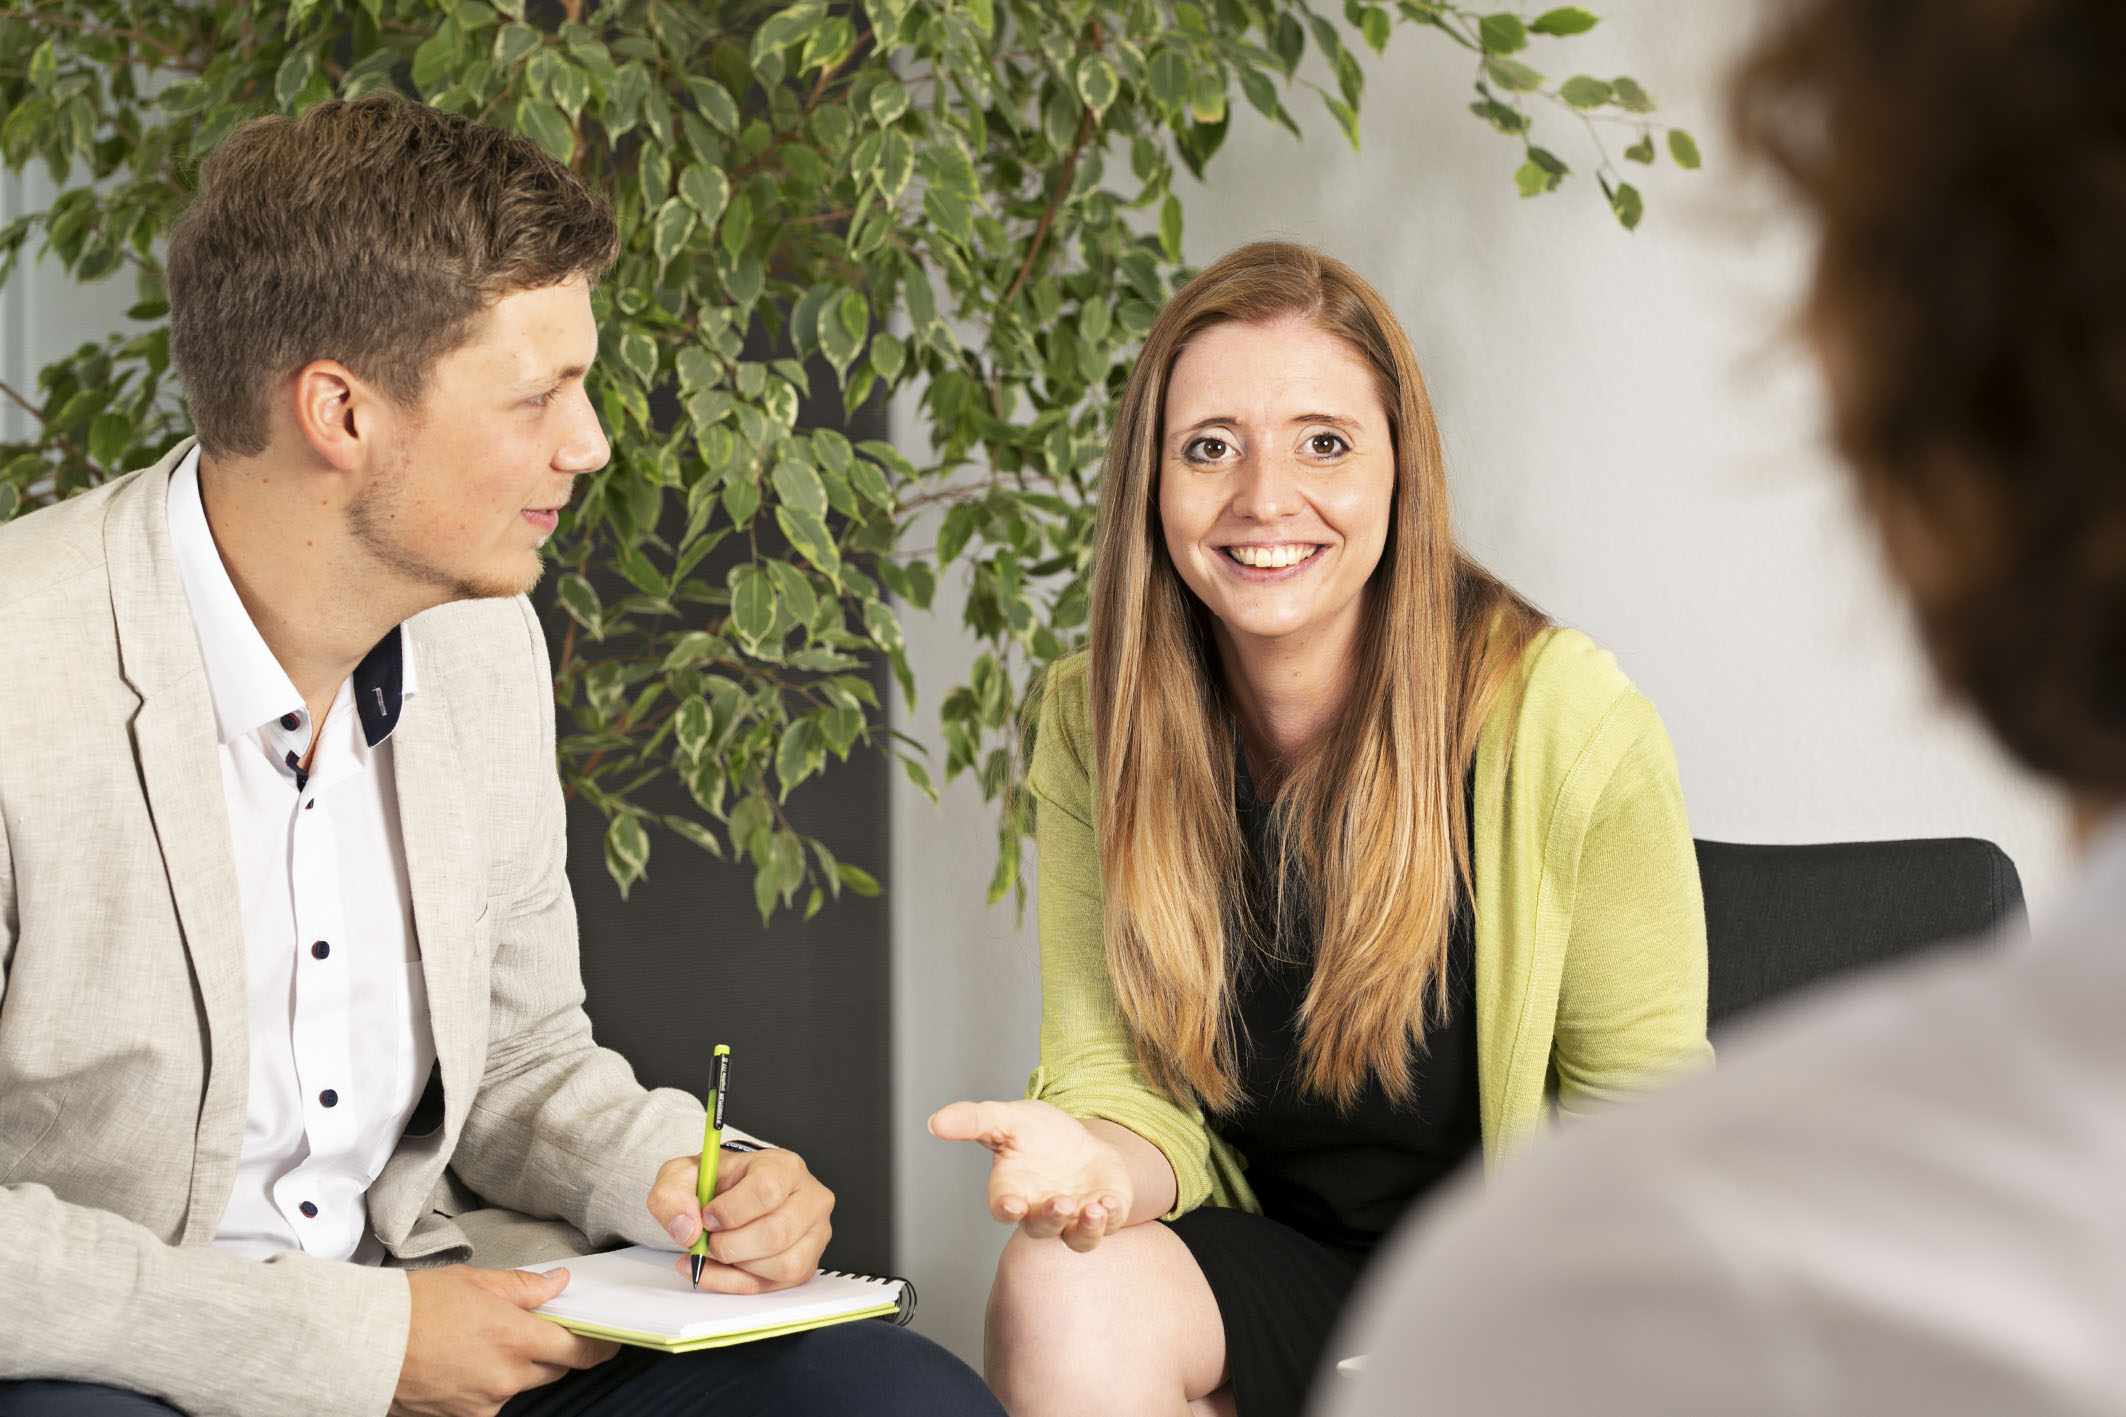 New Work Culture – Kommunikation – Aktives Zuhören